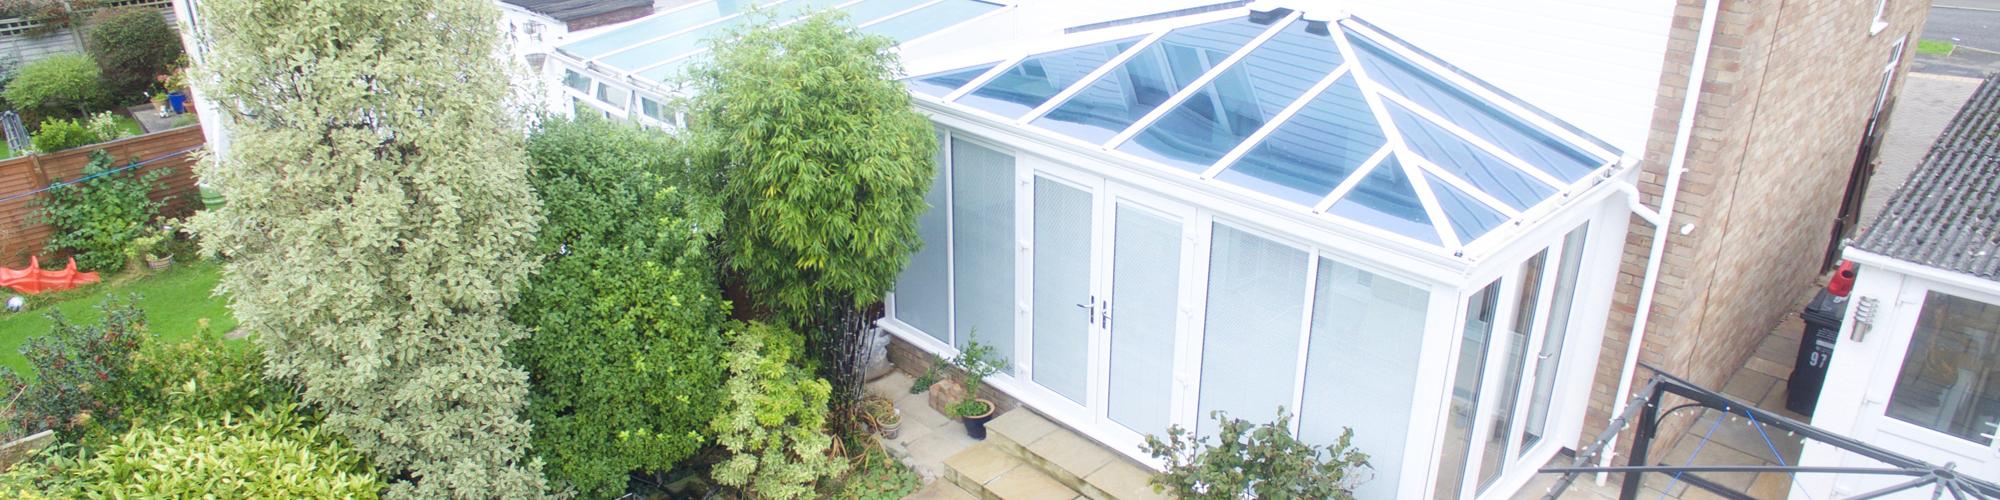 Georgian Conservatory Sherborne Top